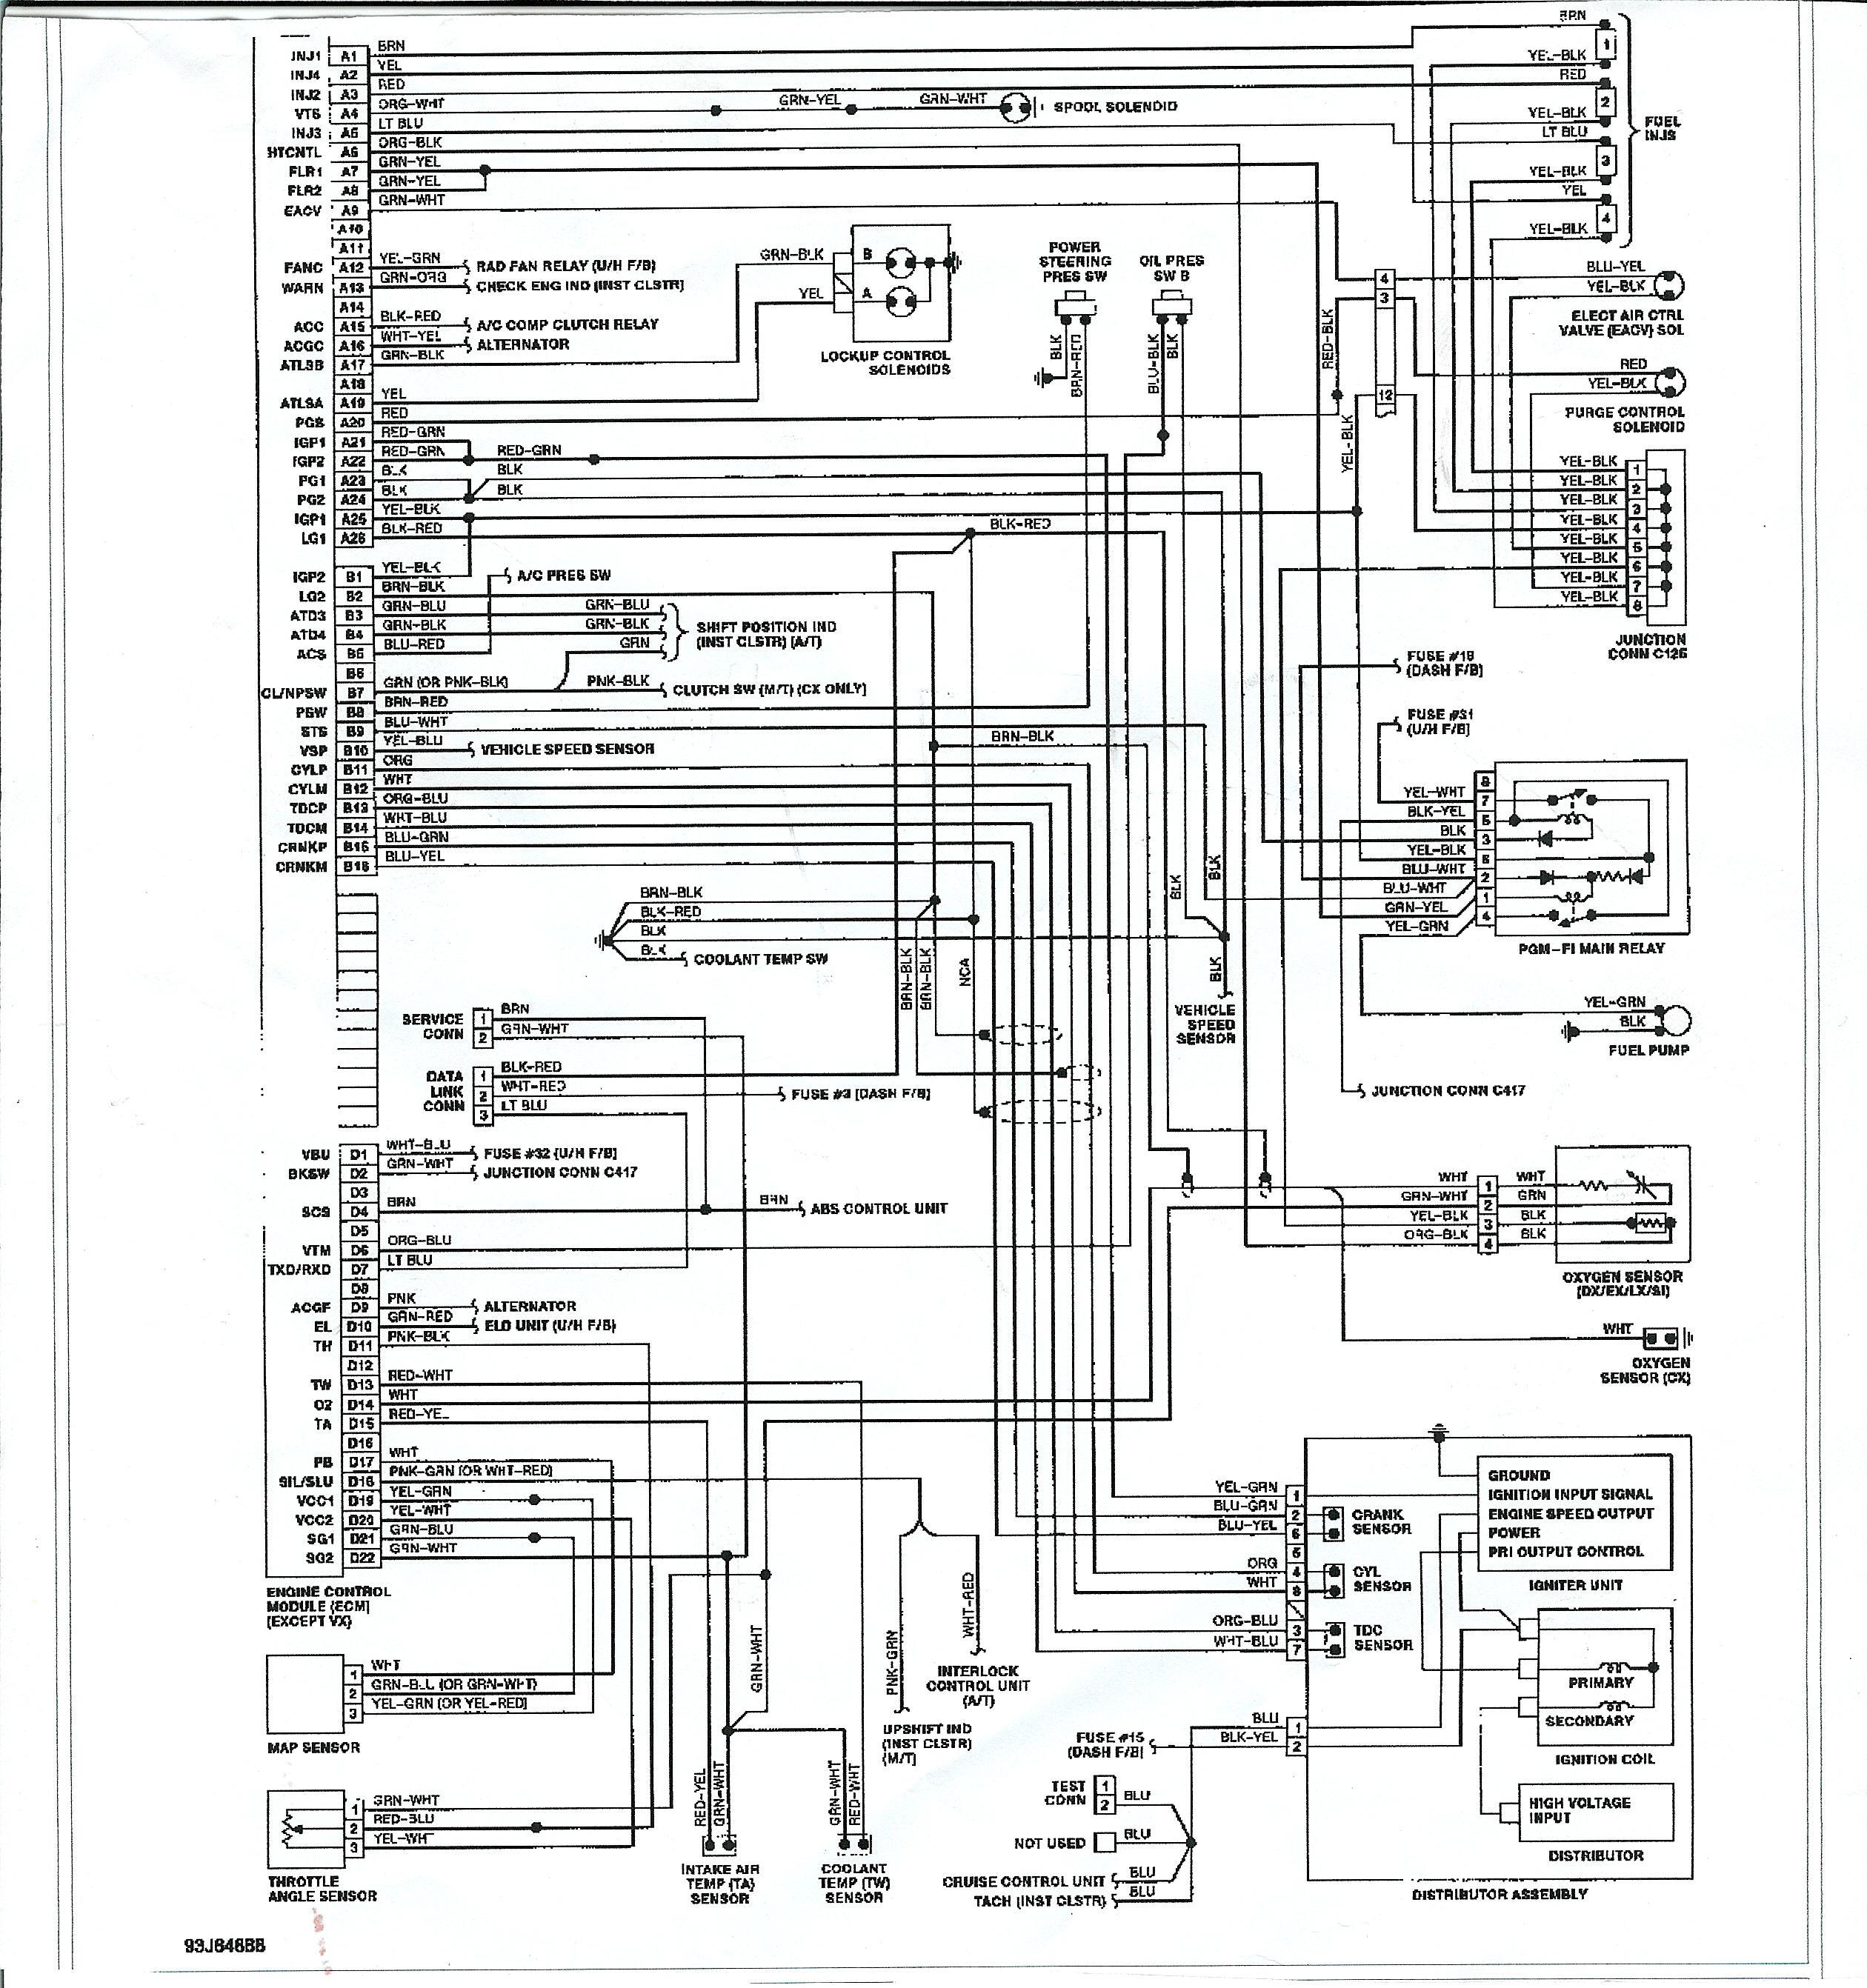 Tcm Wiring Diagram For Audi97 | Wiring Diagrams Eternal drain | Acura Integra Gsr Wiring Diagram |  | farmaciabaron.it